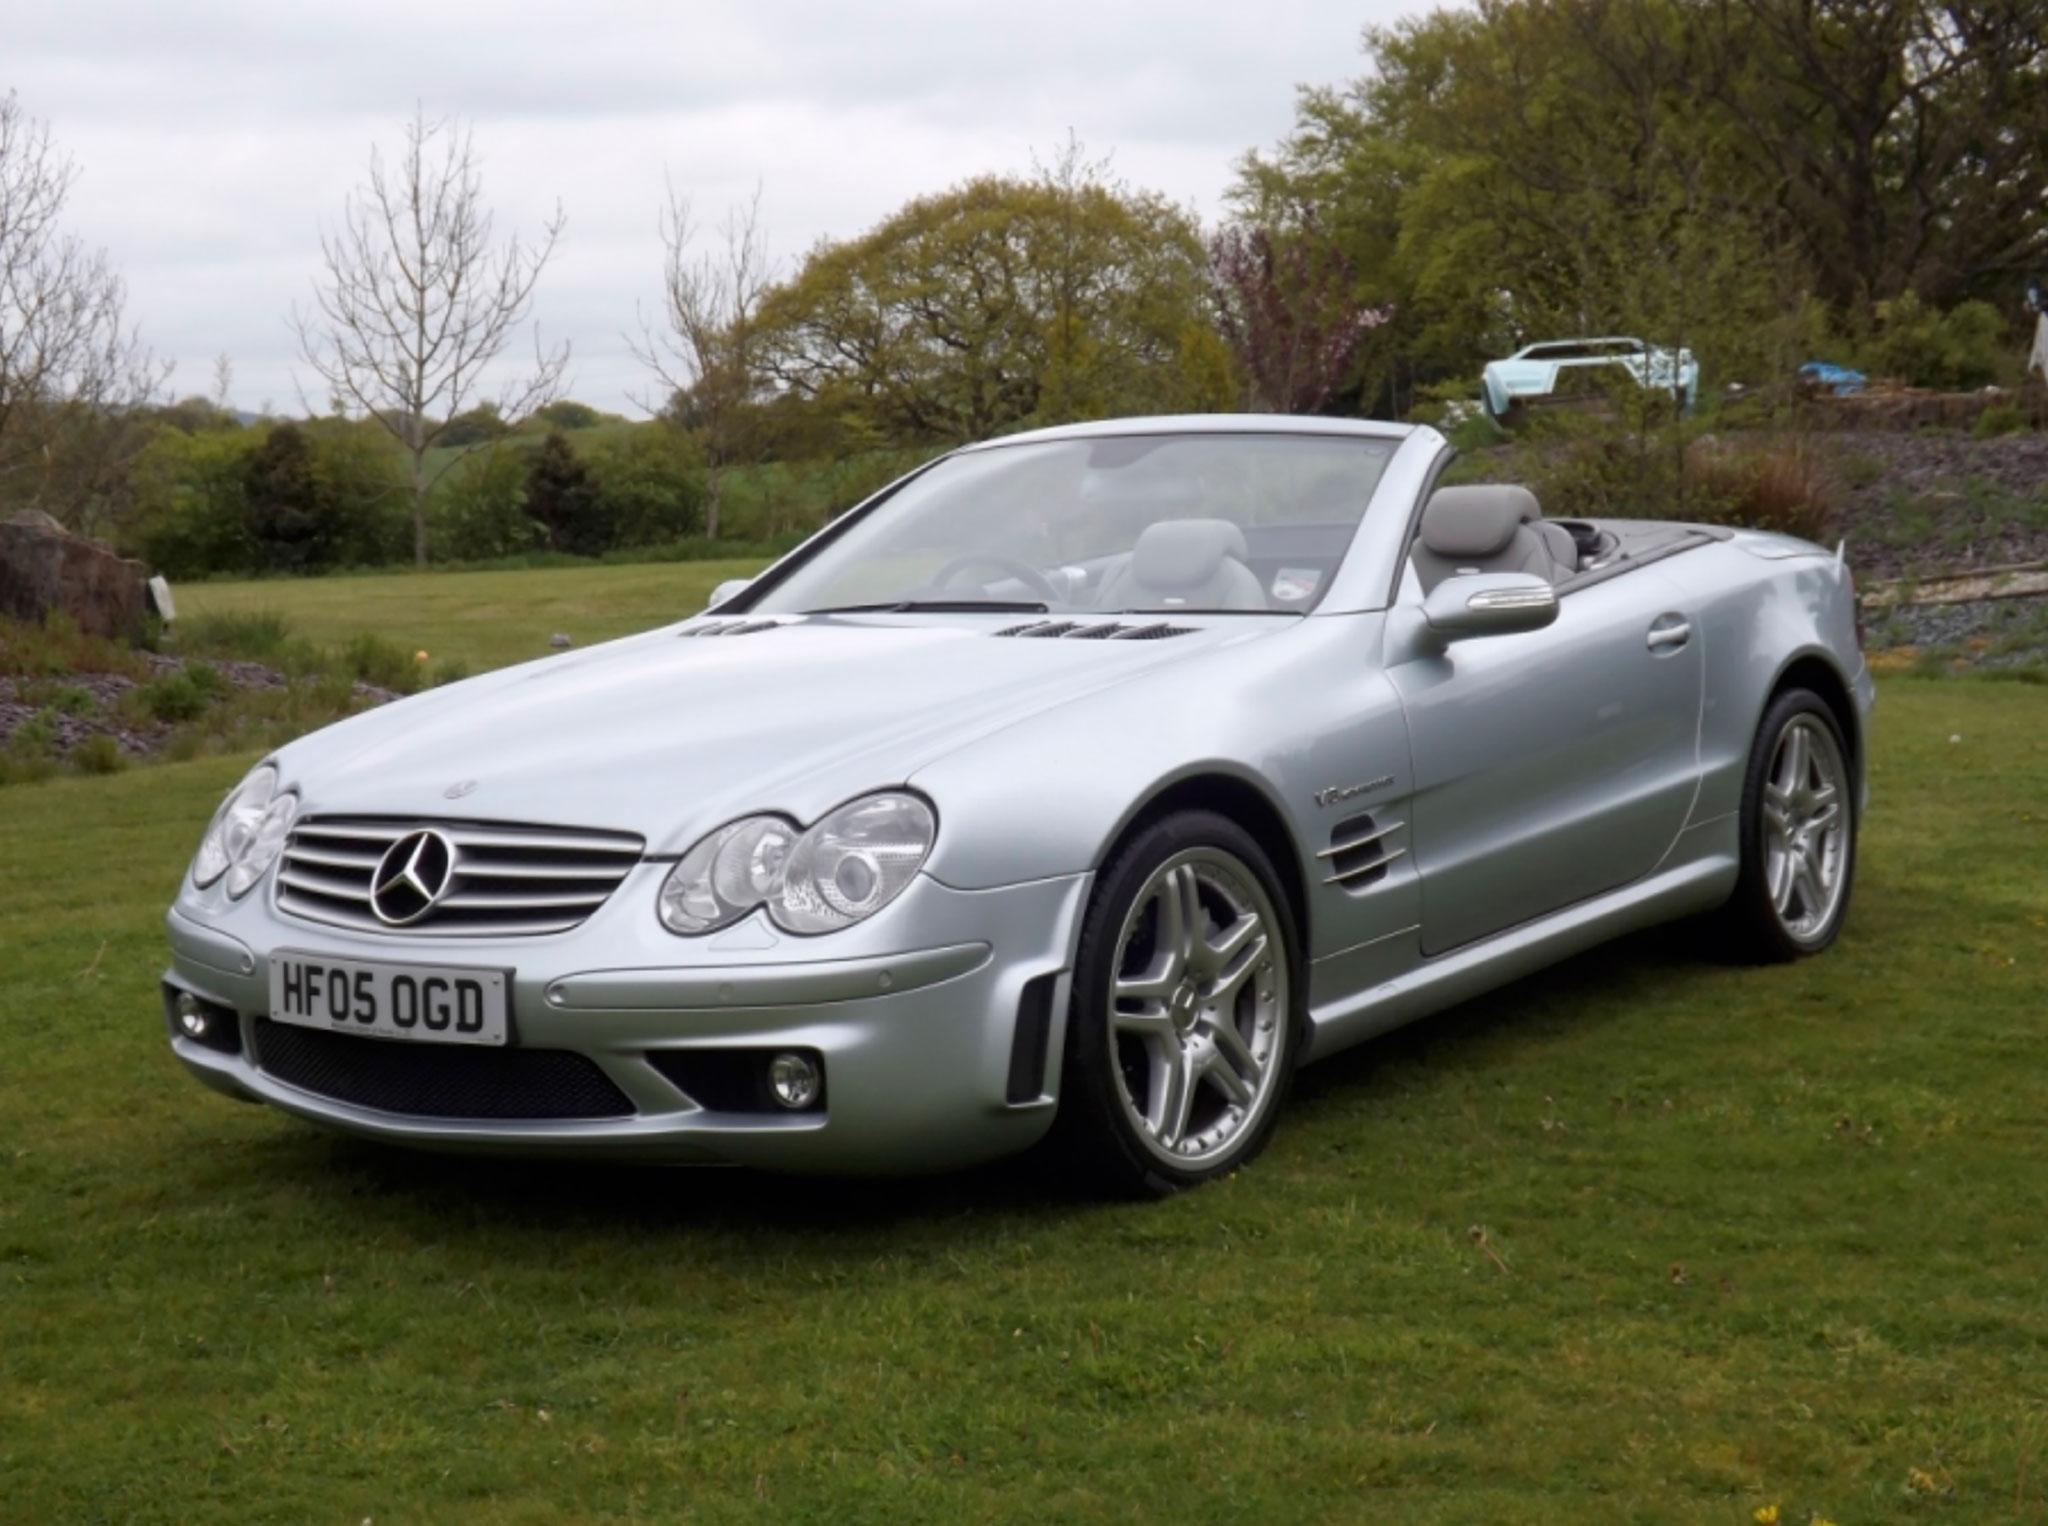 2005 Mercedes-Benz SL55 AMG F1 R230 ayant parcouru 21,800 miles - CCA au London Classic Car Show 2021.